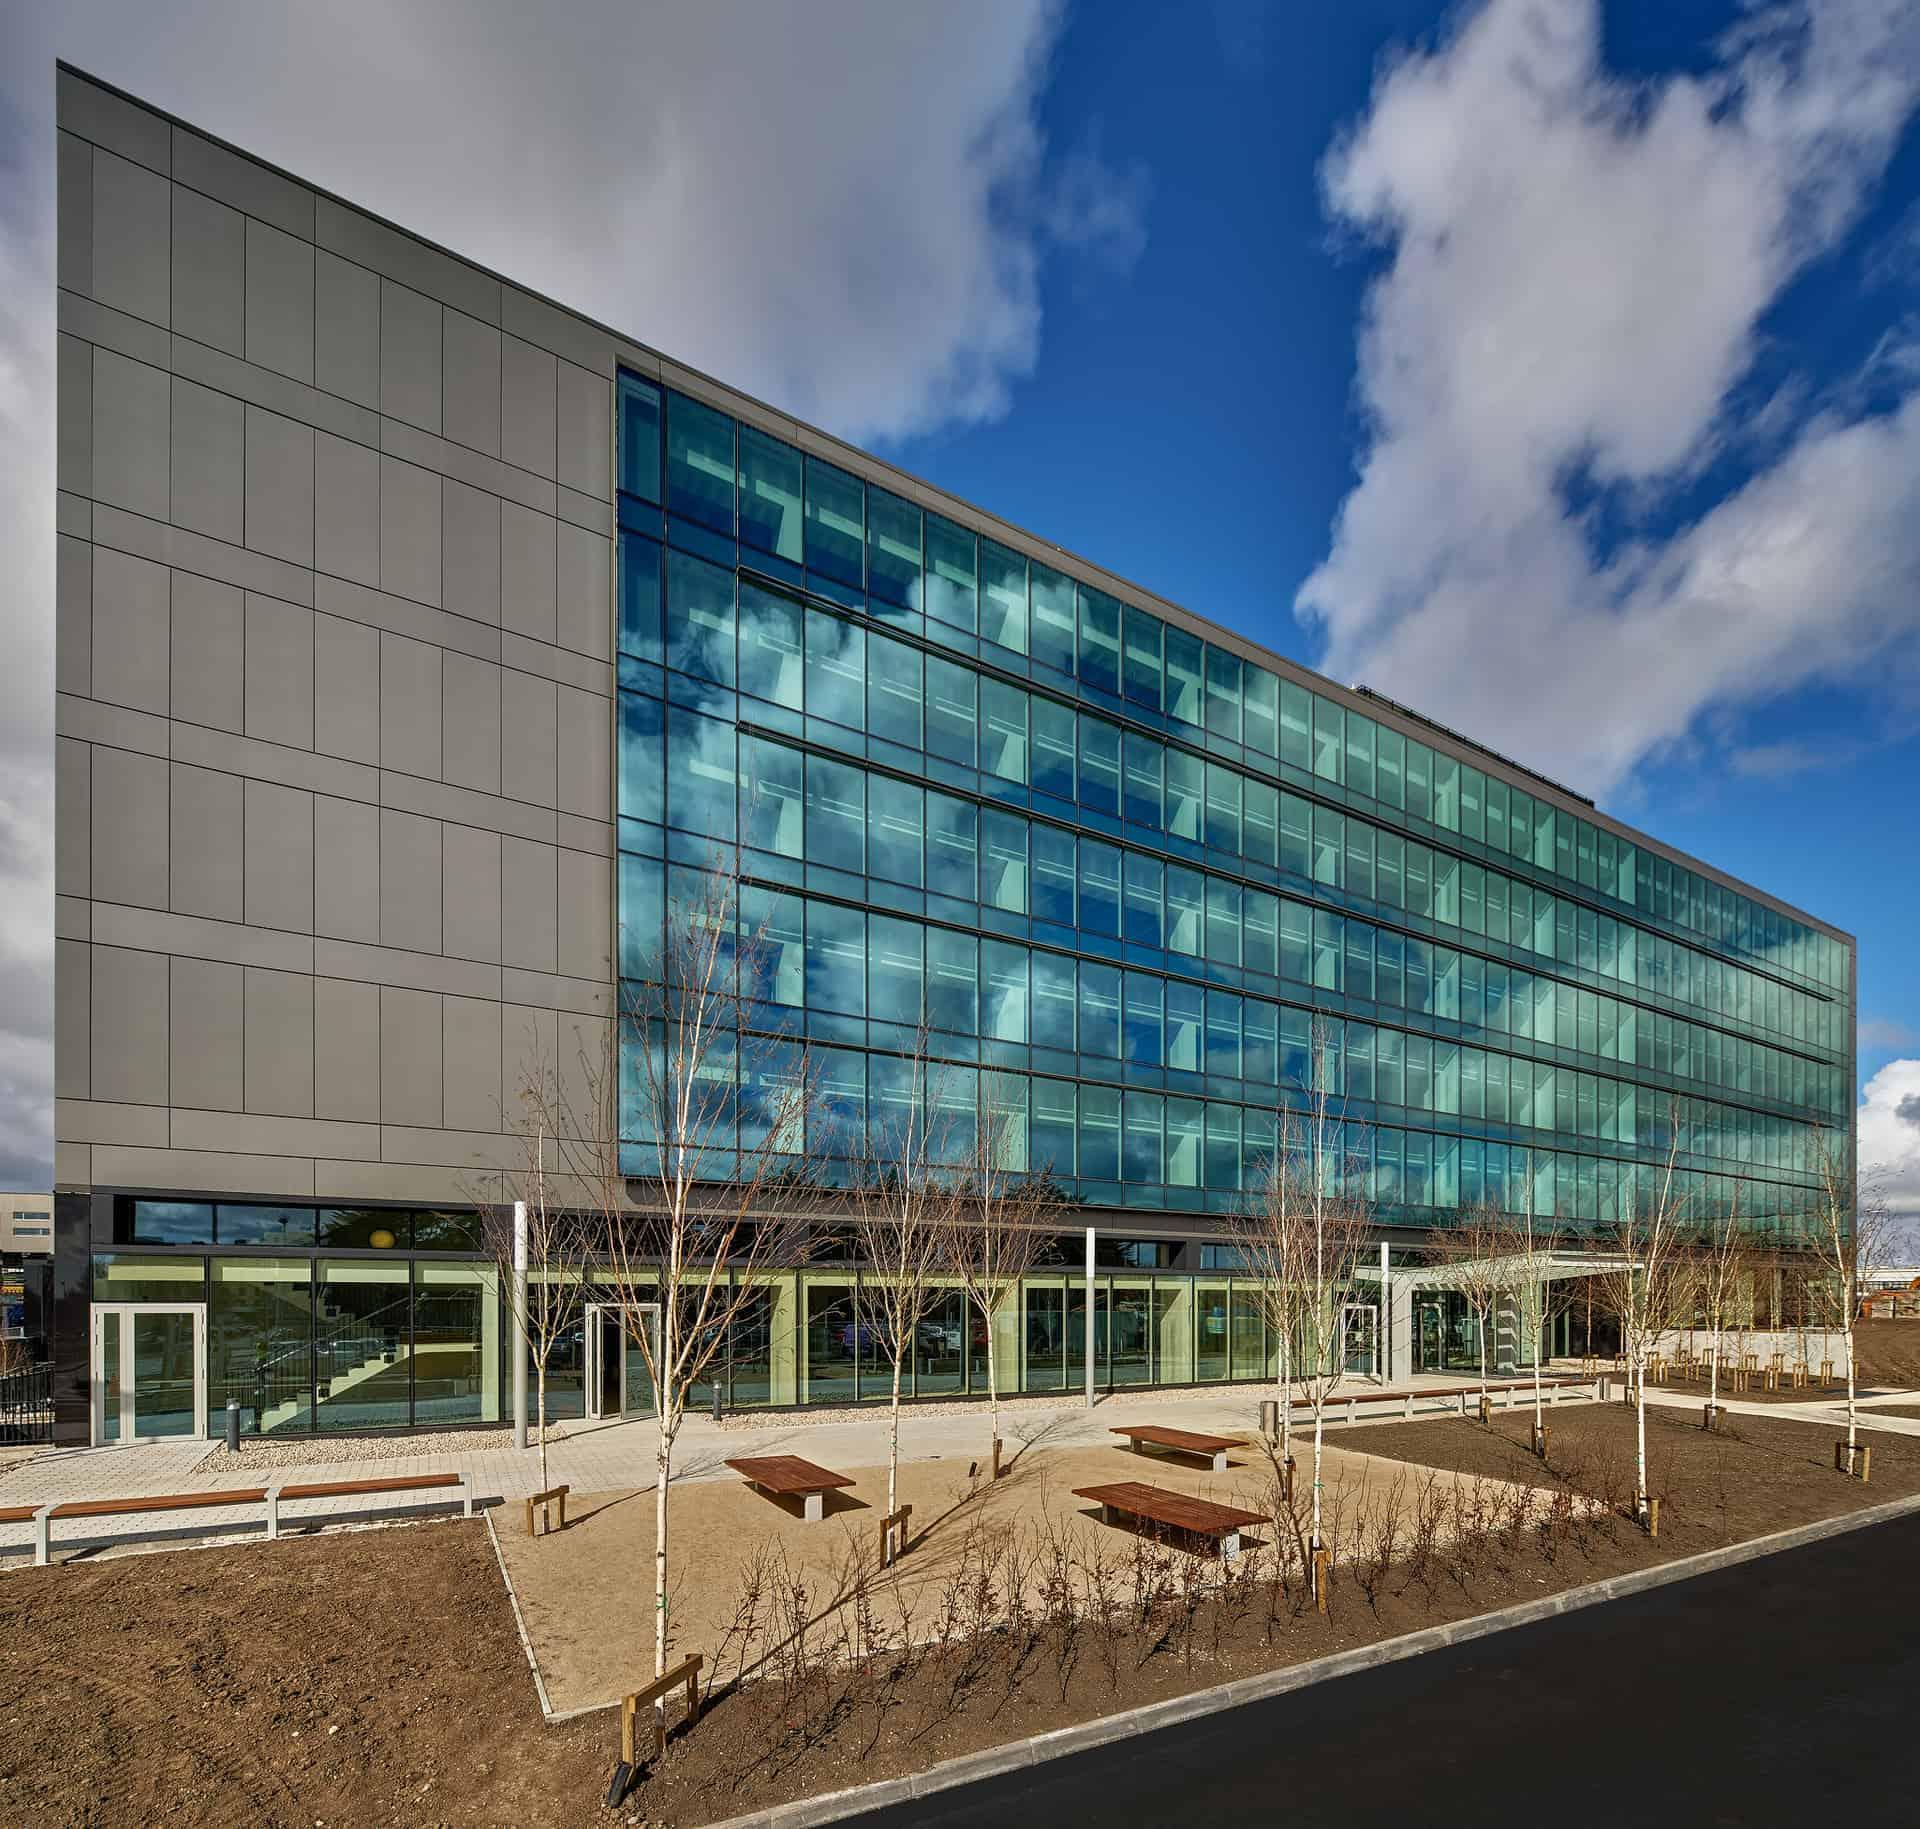 DAA-Building-2015-03-31-_DSC9586-flat